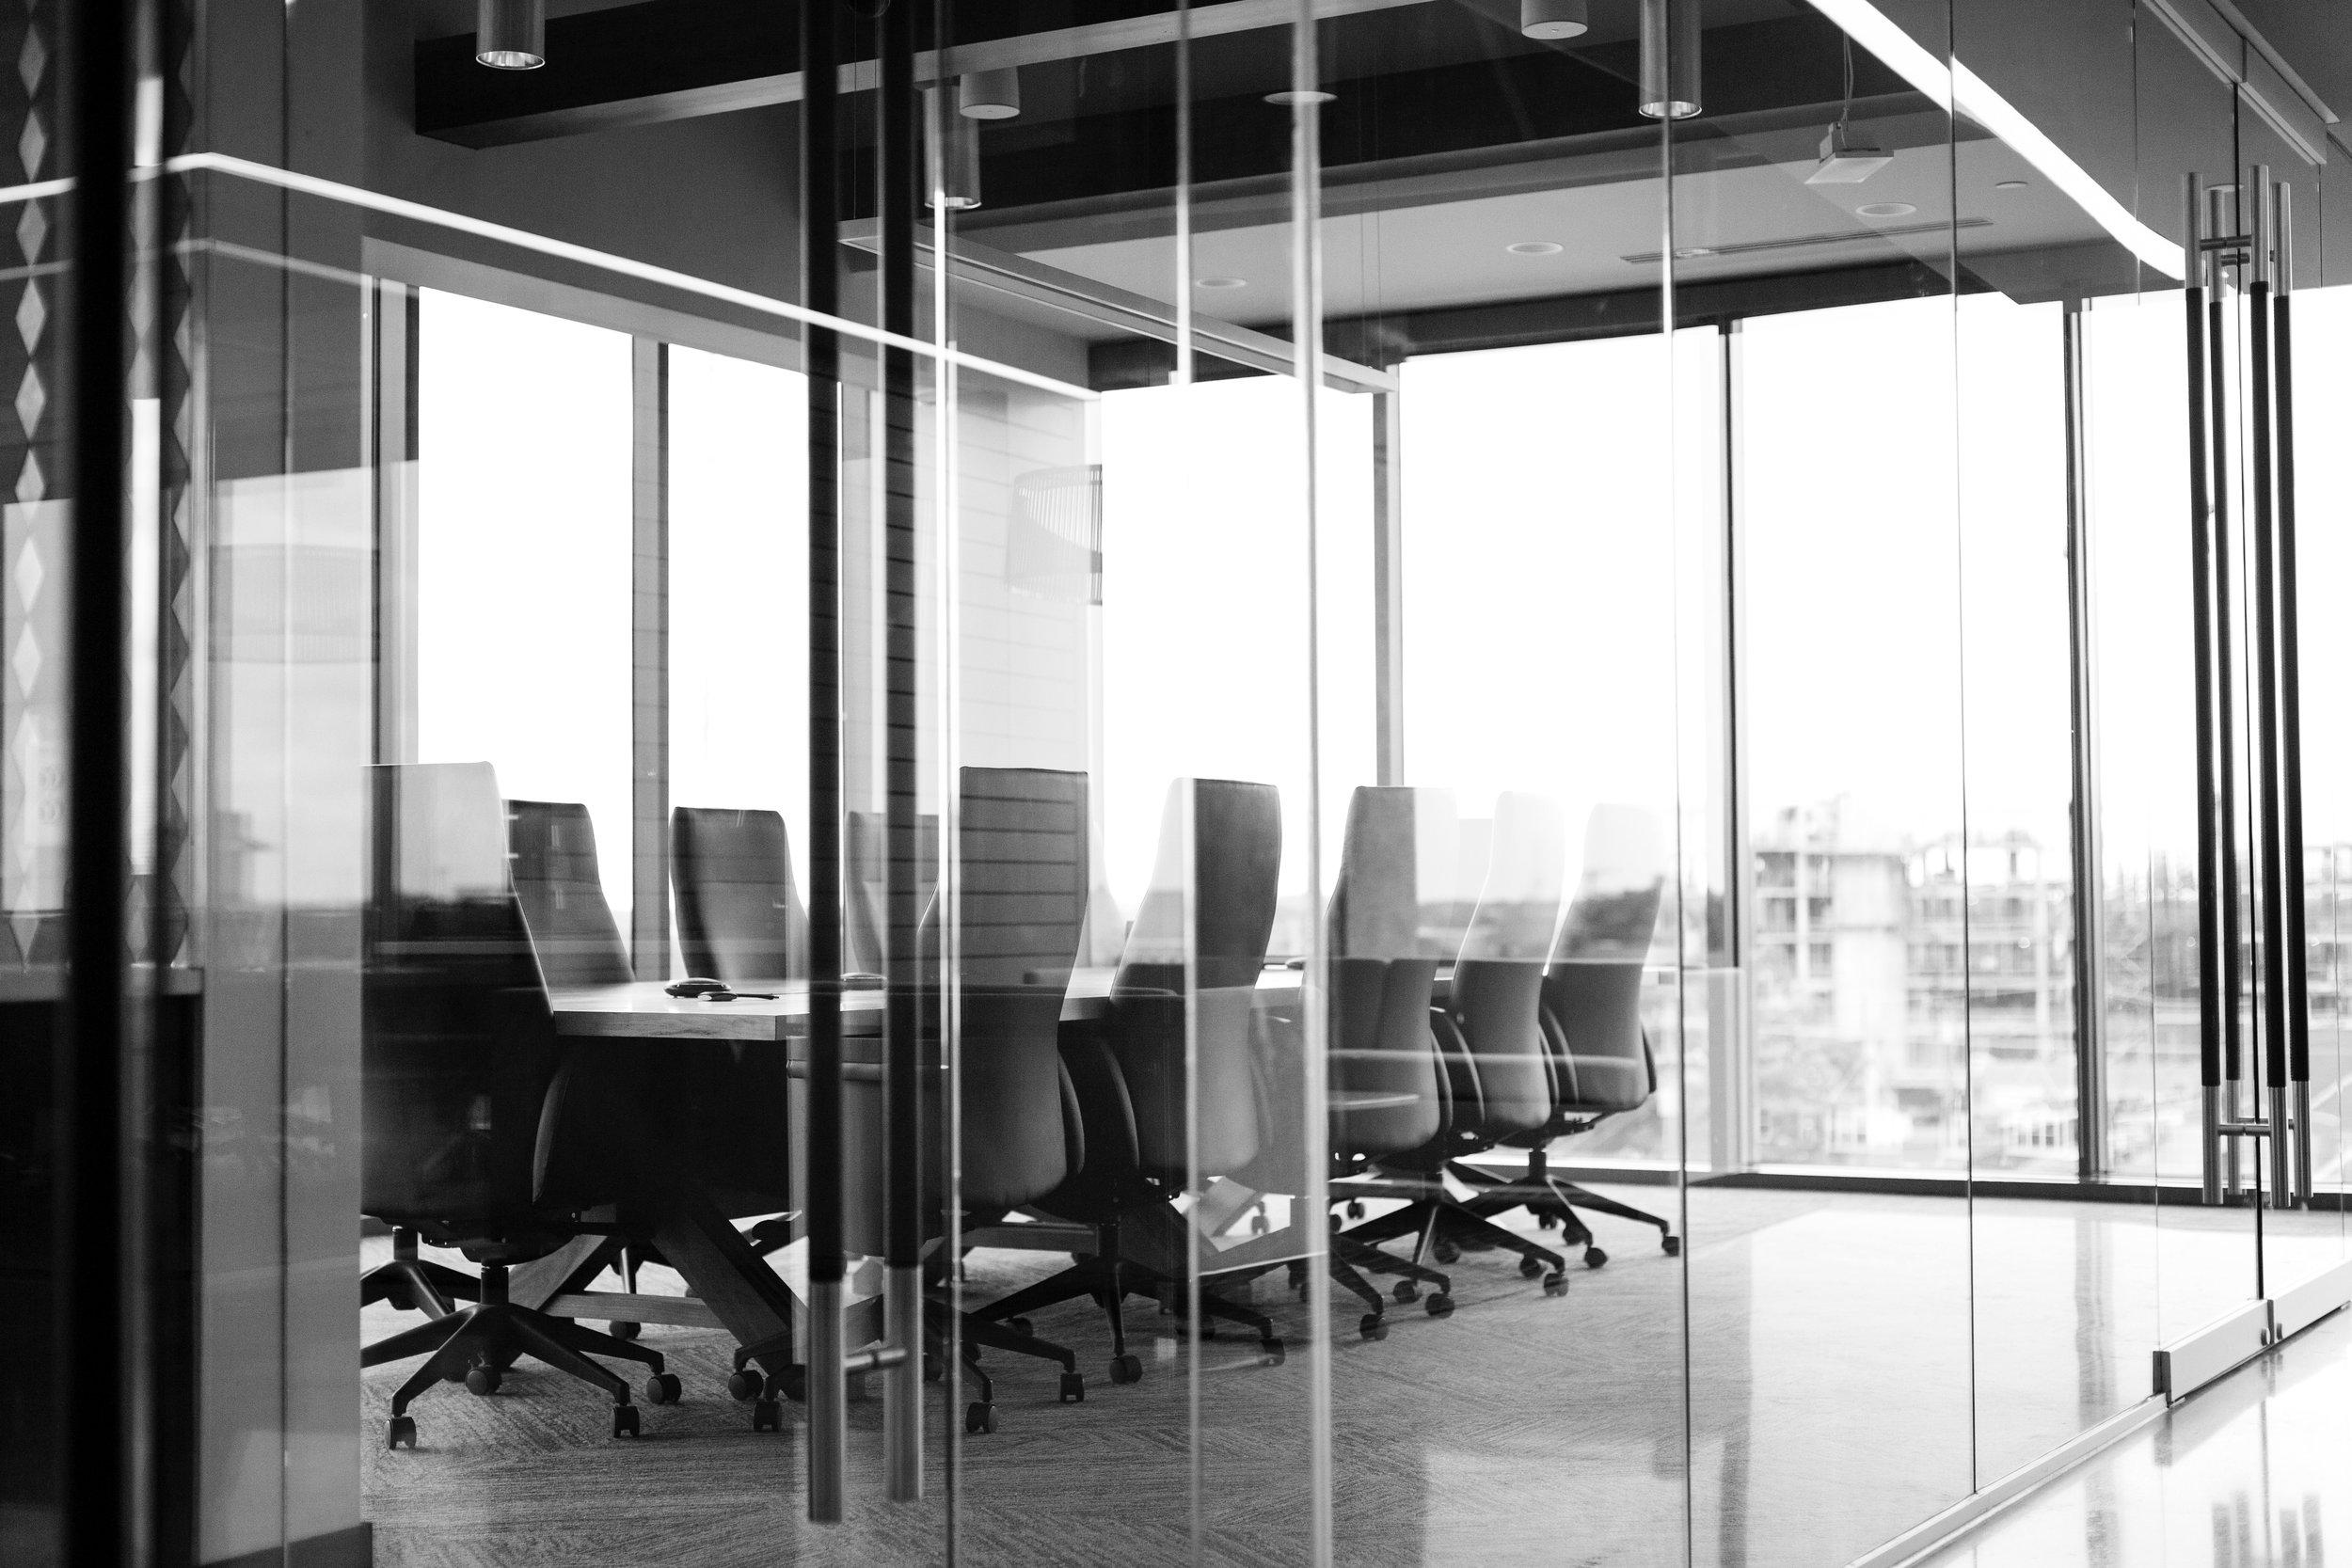 drew-beamer-679505-unsplash Glass black and white Board room.jpg